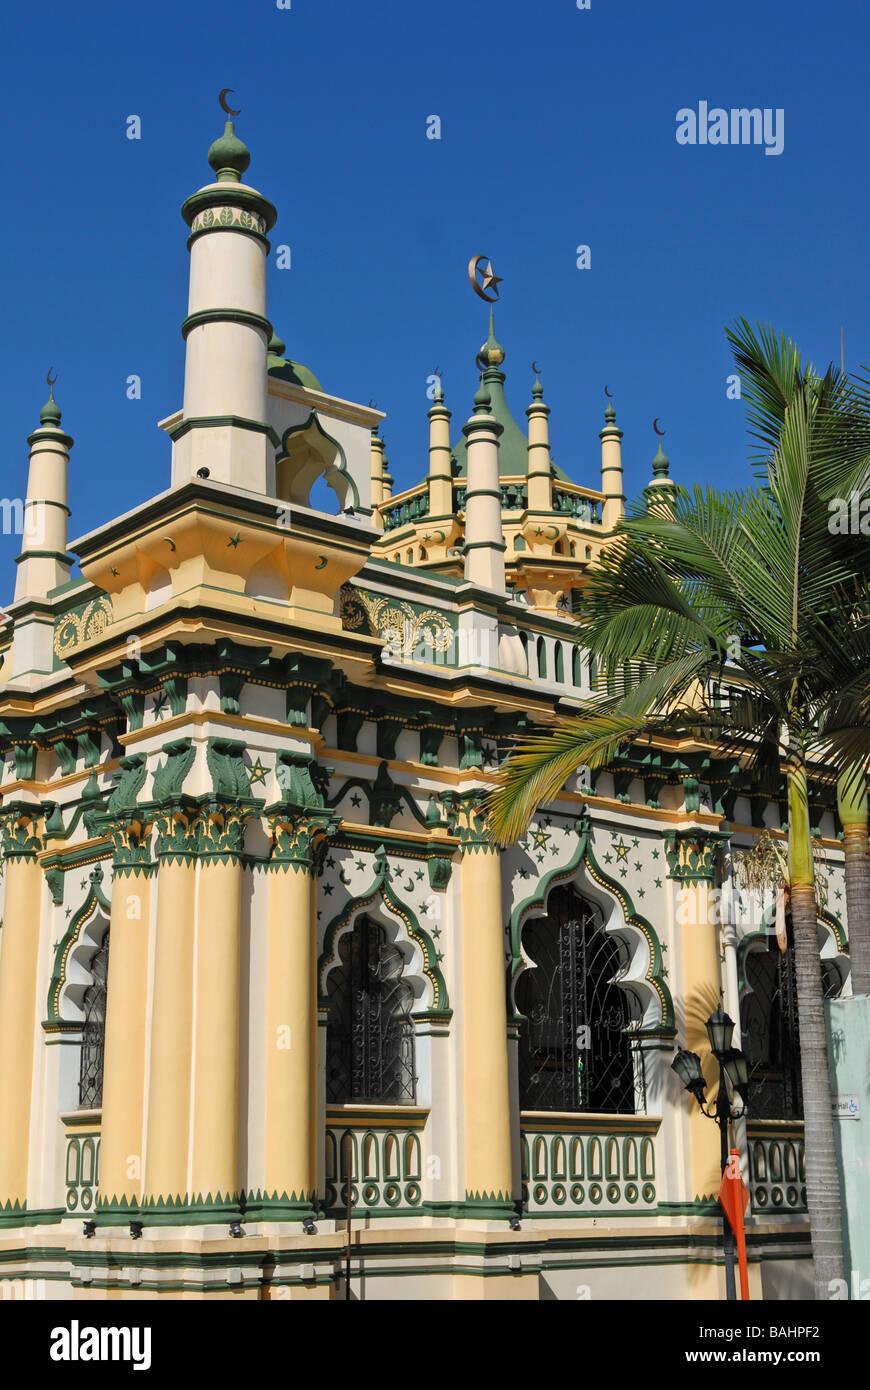 Abdul-Ghaffoor Moschee, Singapur - Stock Image